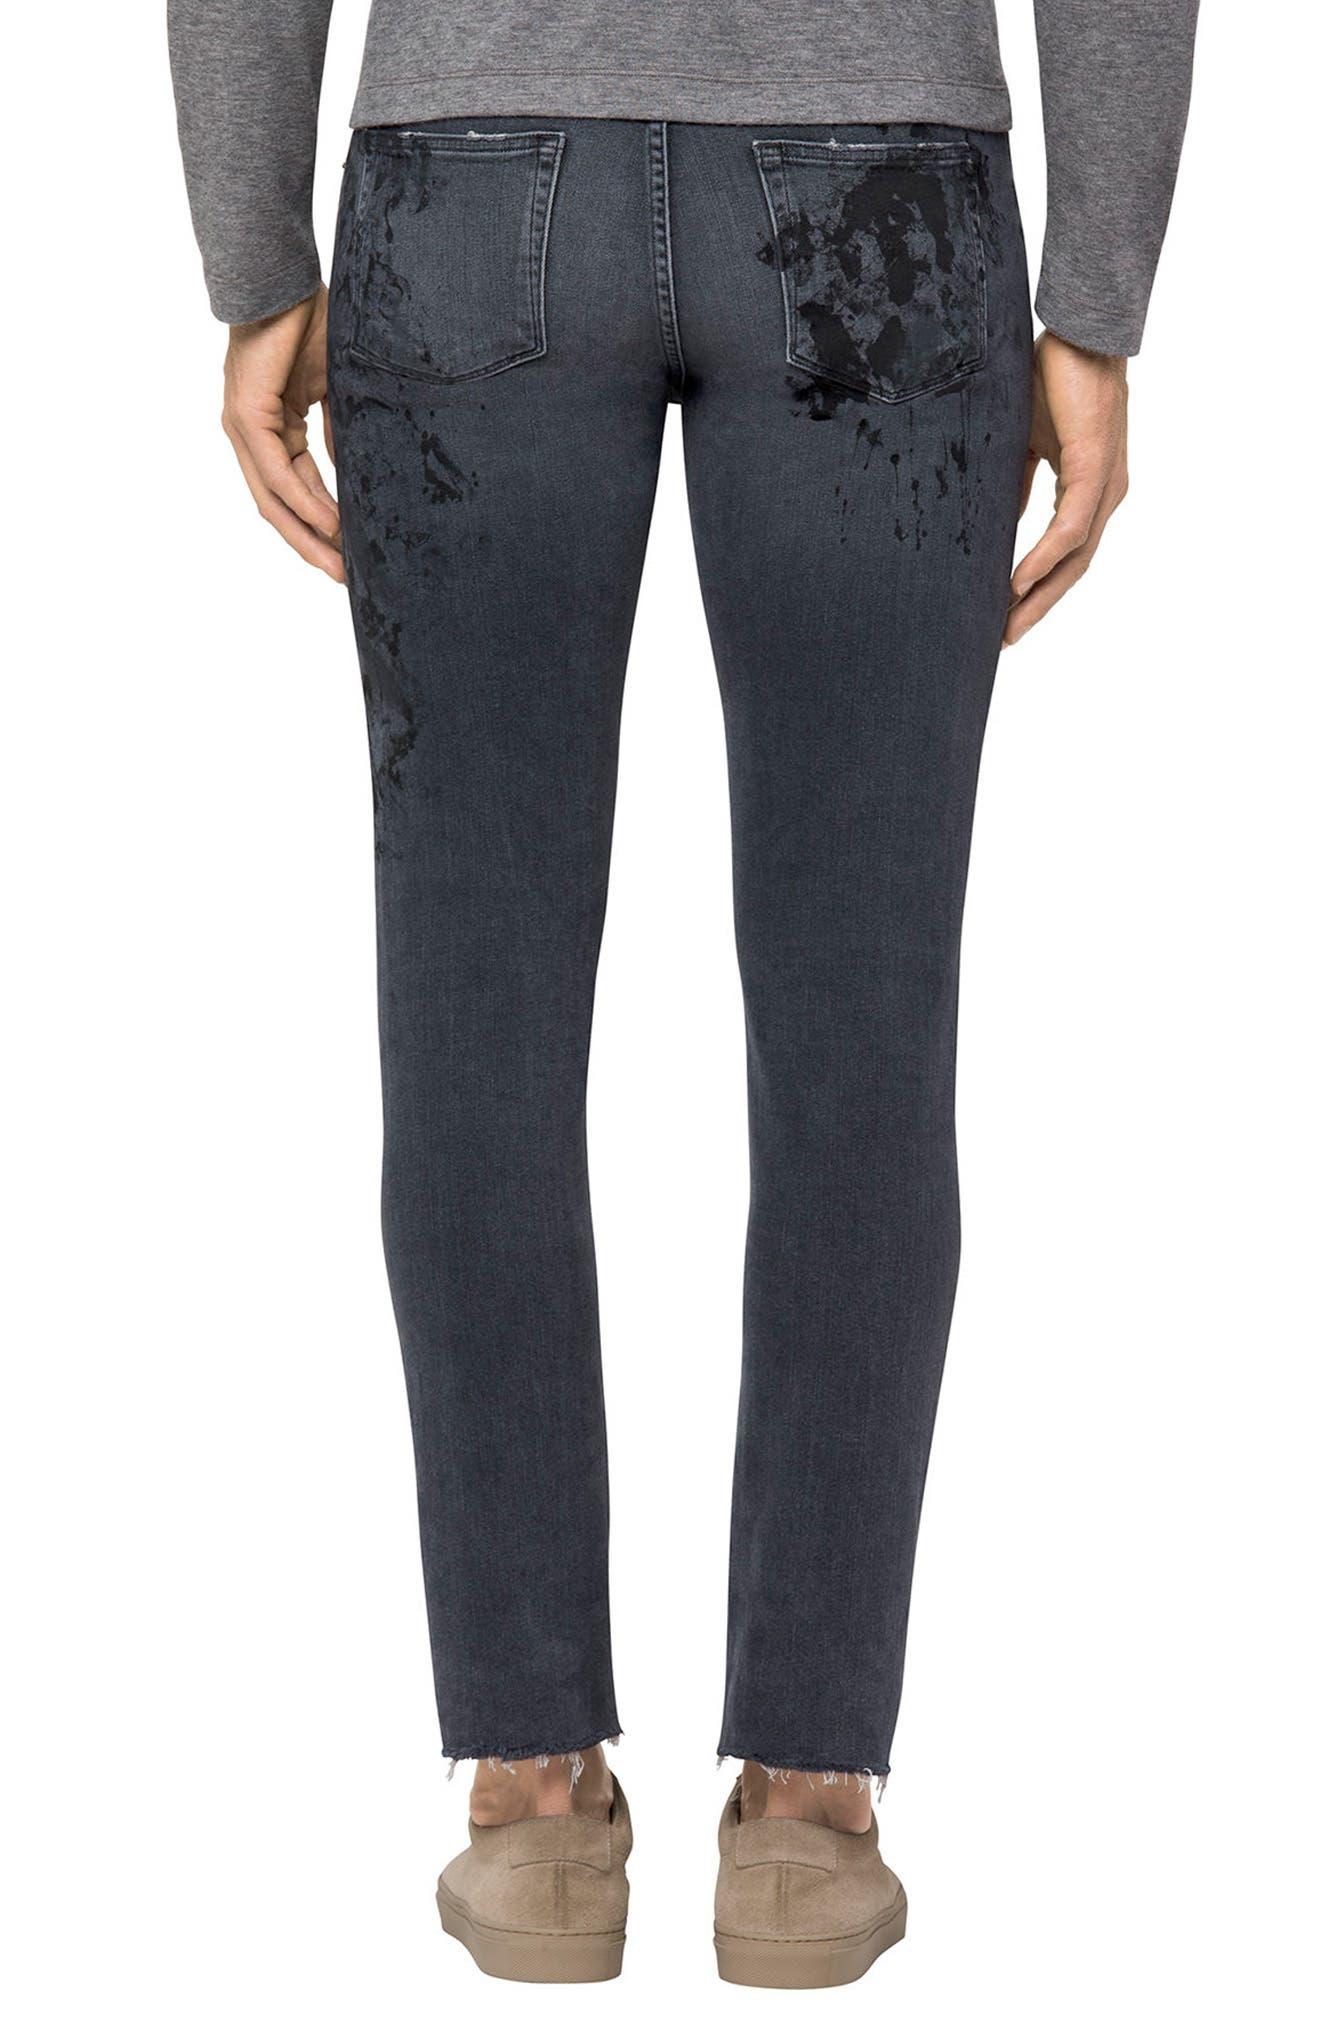 Mick Skinny Fit Jeans,                             Alternate thumbnail 2, color,                             Vitreous